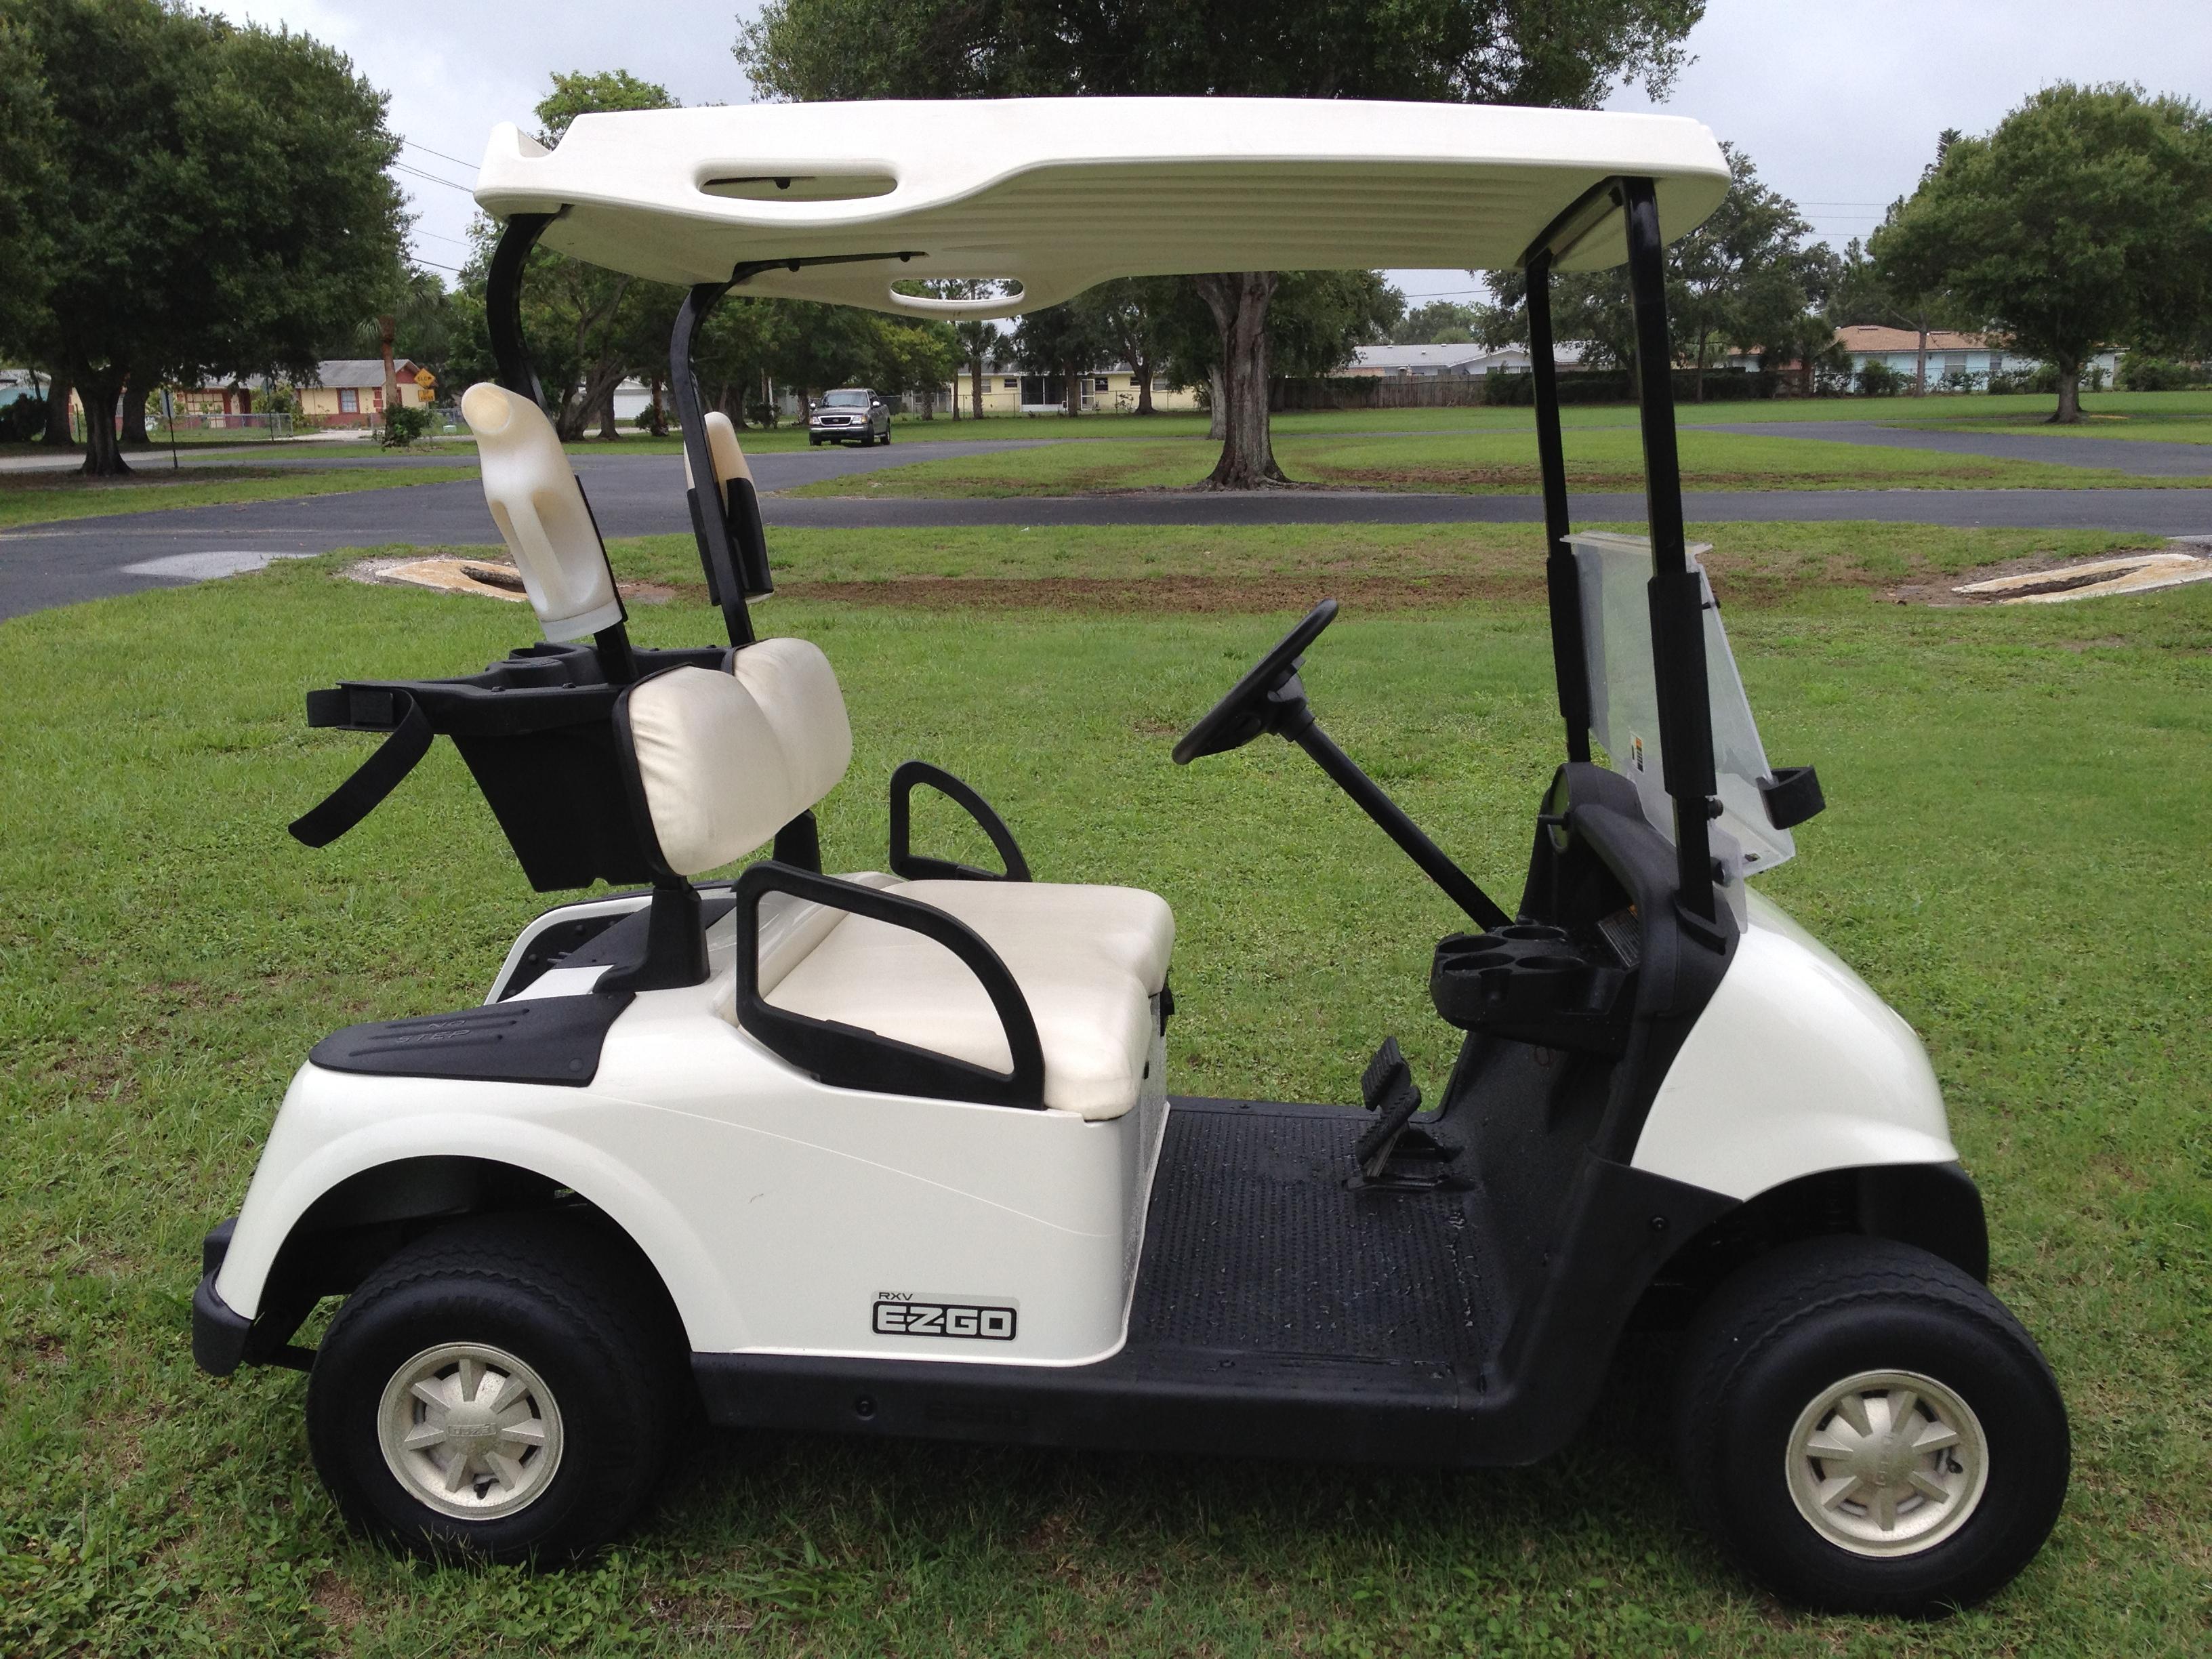 2009 Ezgo Rxv Golf Cart Controller Wiring Diagram 3264x2448